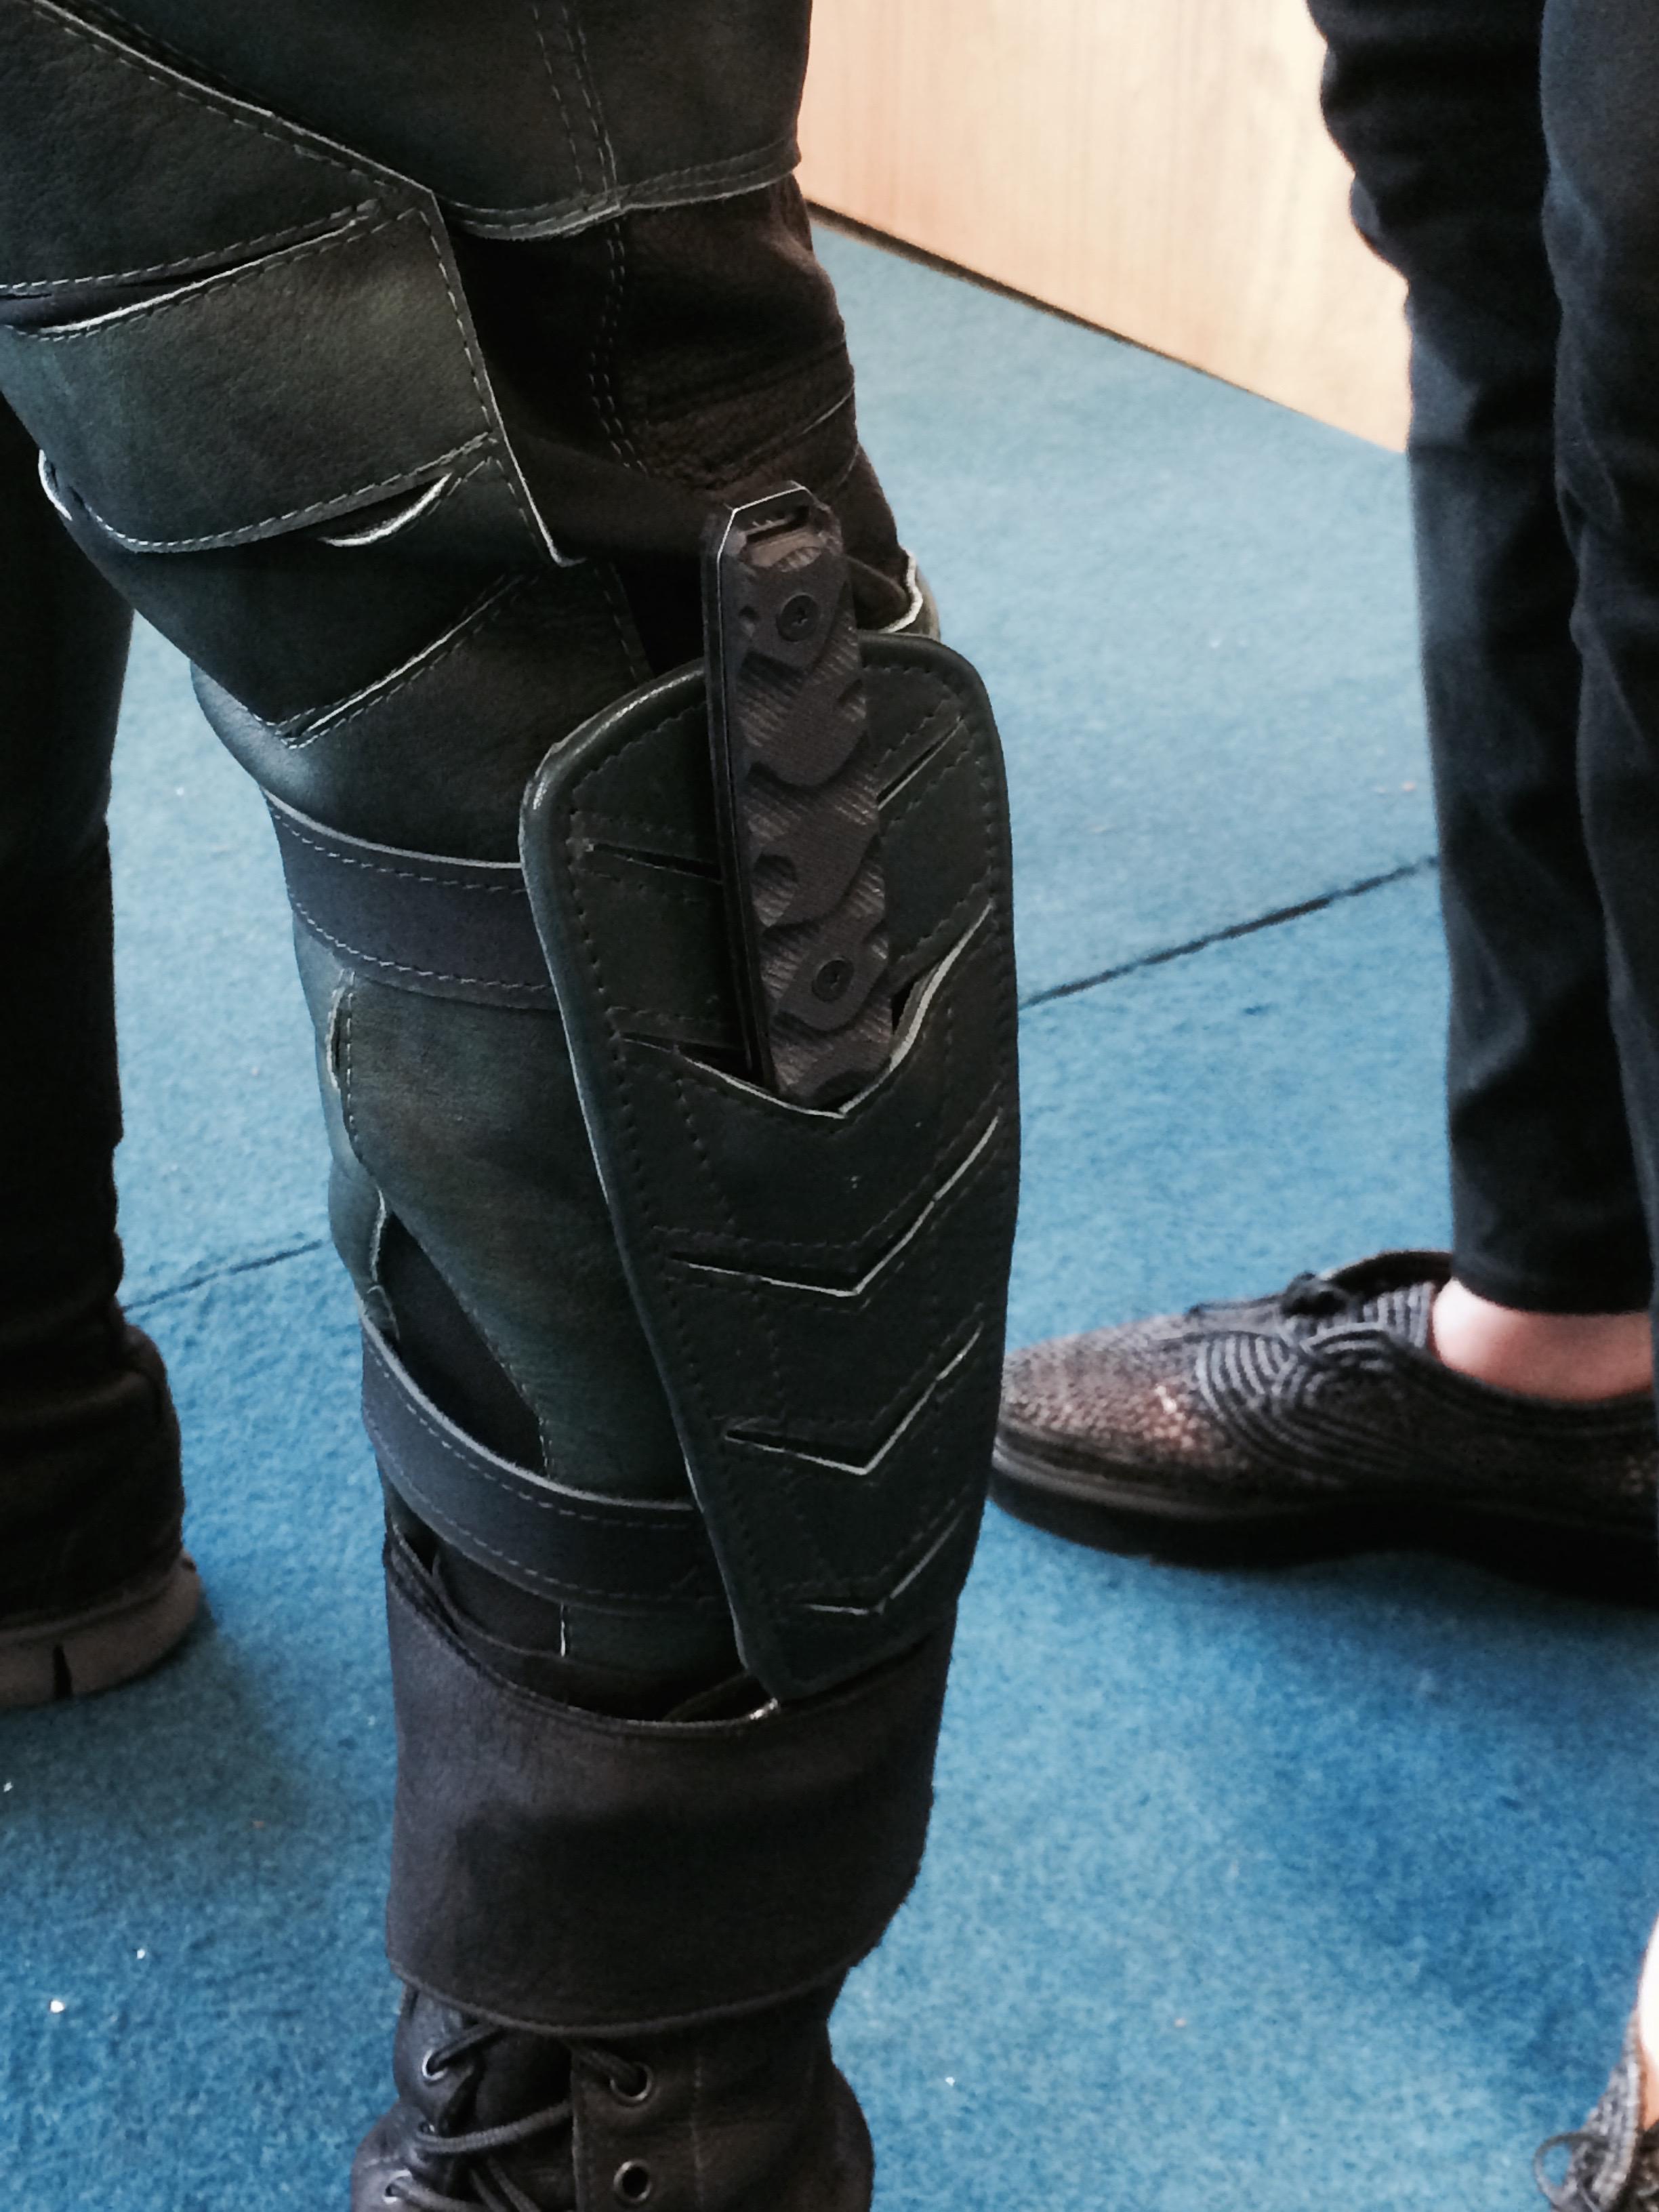 Arrow - Leg Holster